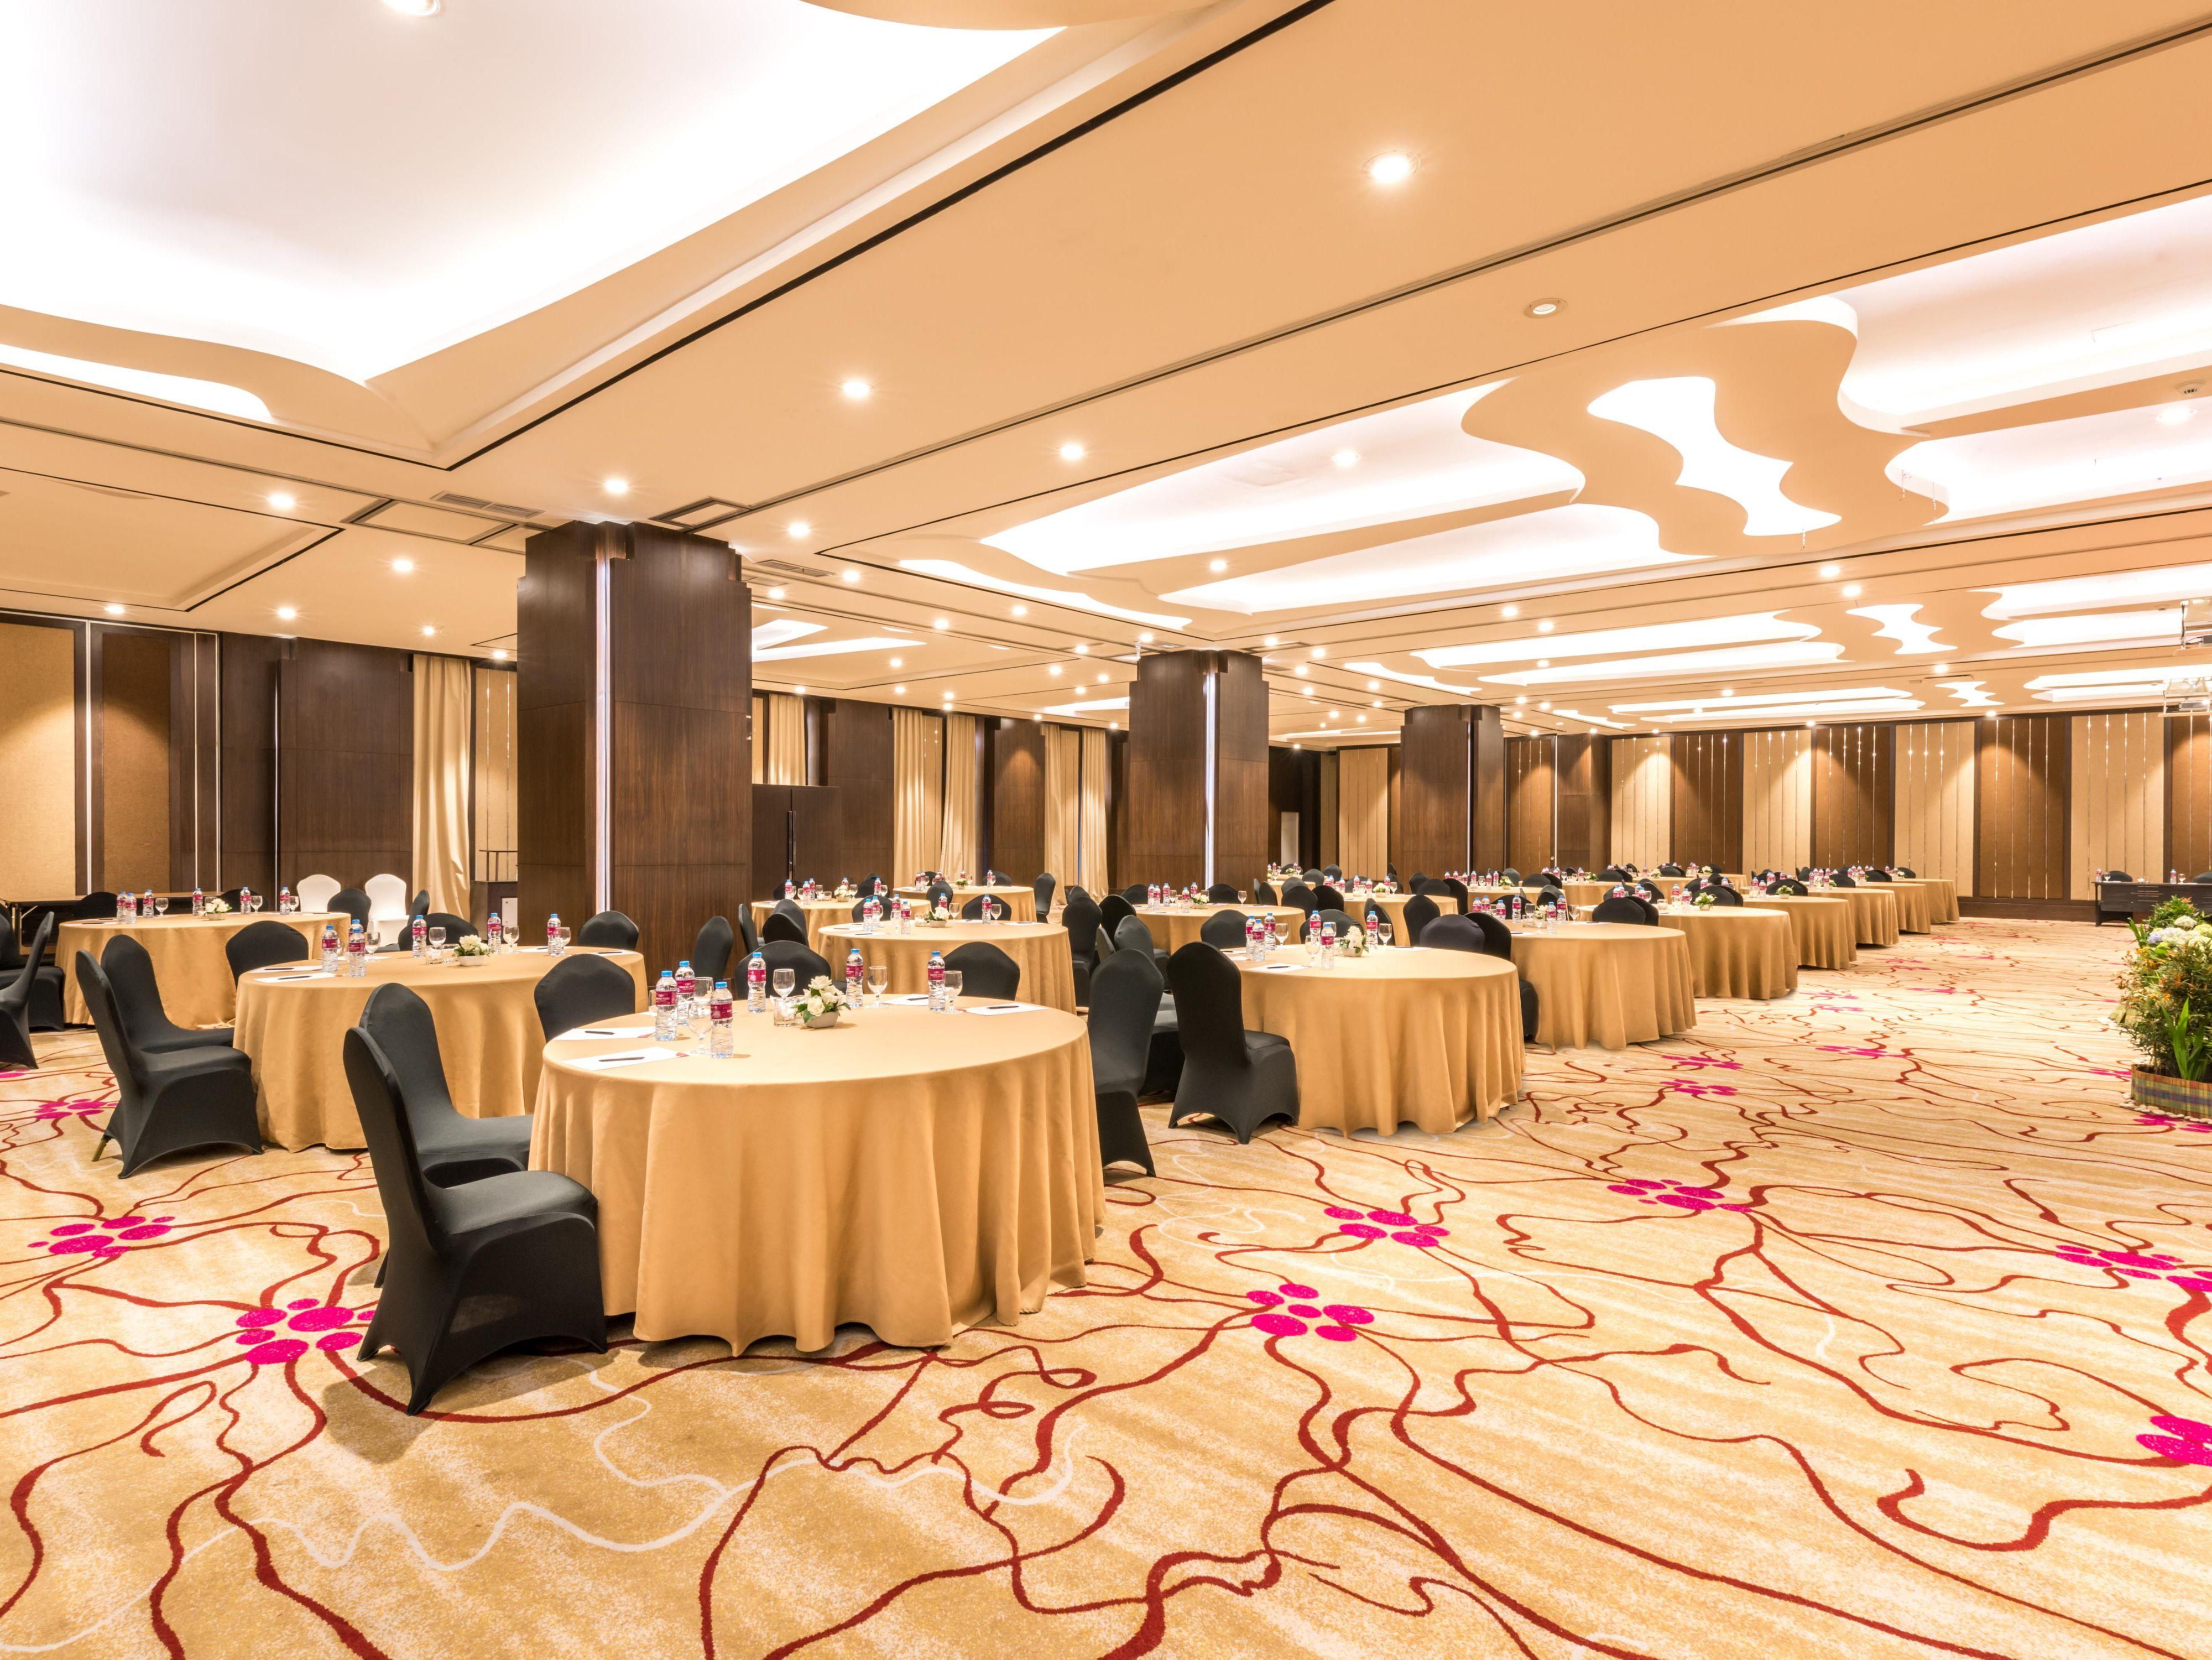 Crowne plaza bandung bandung indonesia hotel ihg groupsandmeetingsphotos junglespirit Images